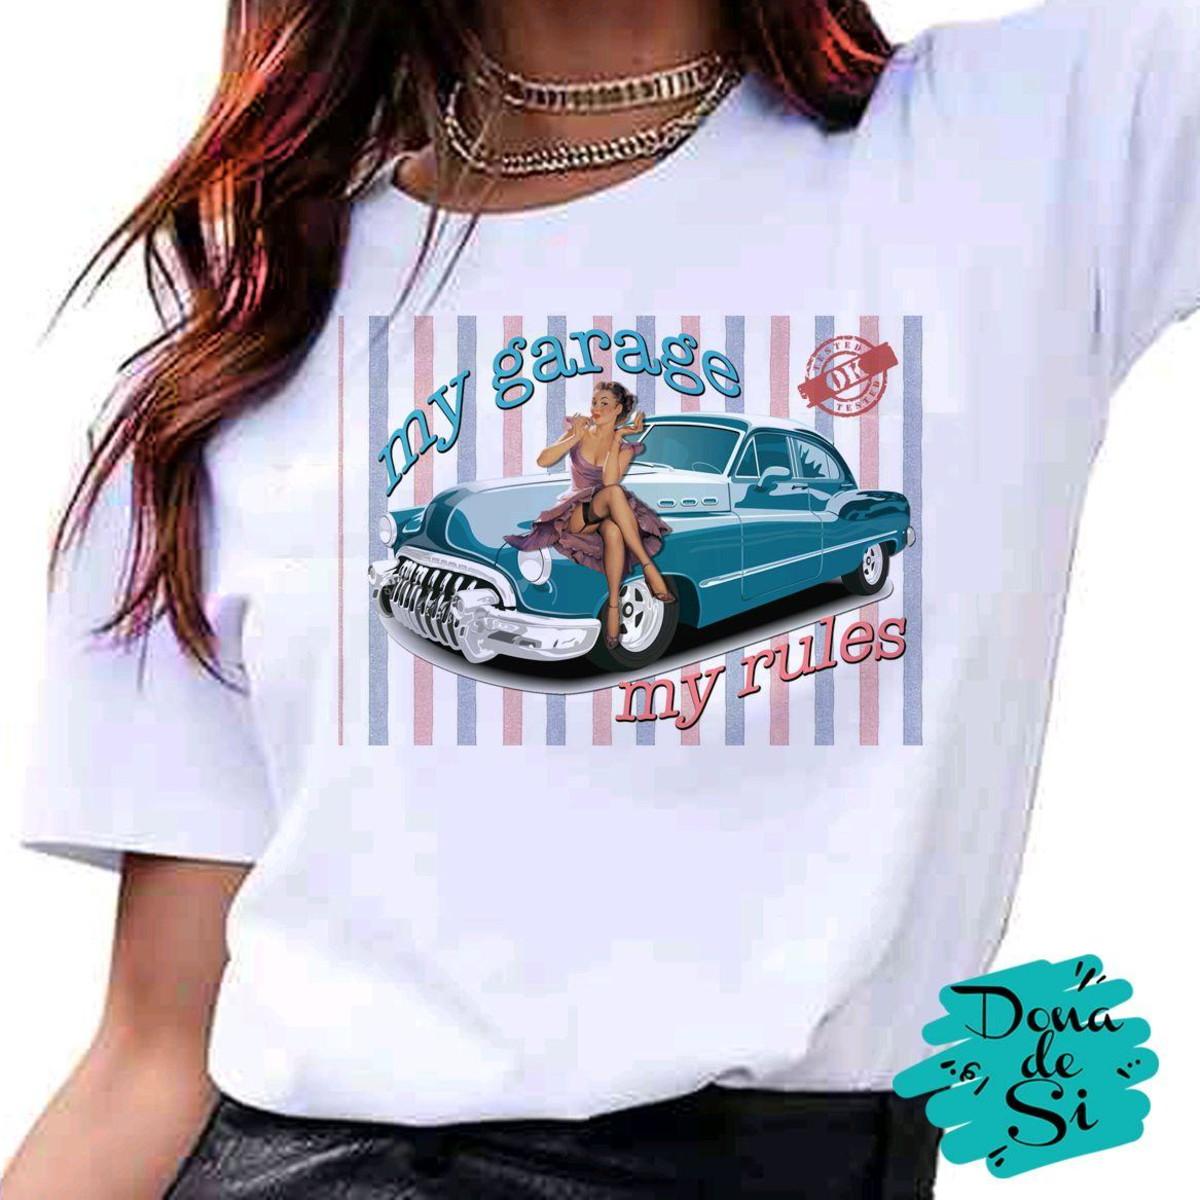 b1e321a964 Camiseta pin up e carro antigo vintage fashion tumblr no Elo7